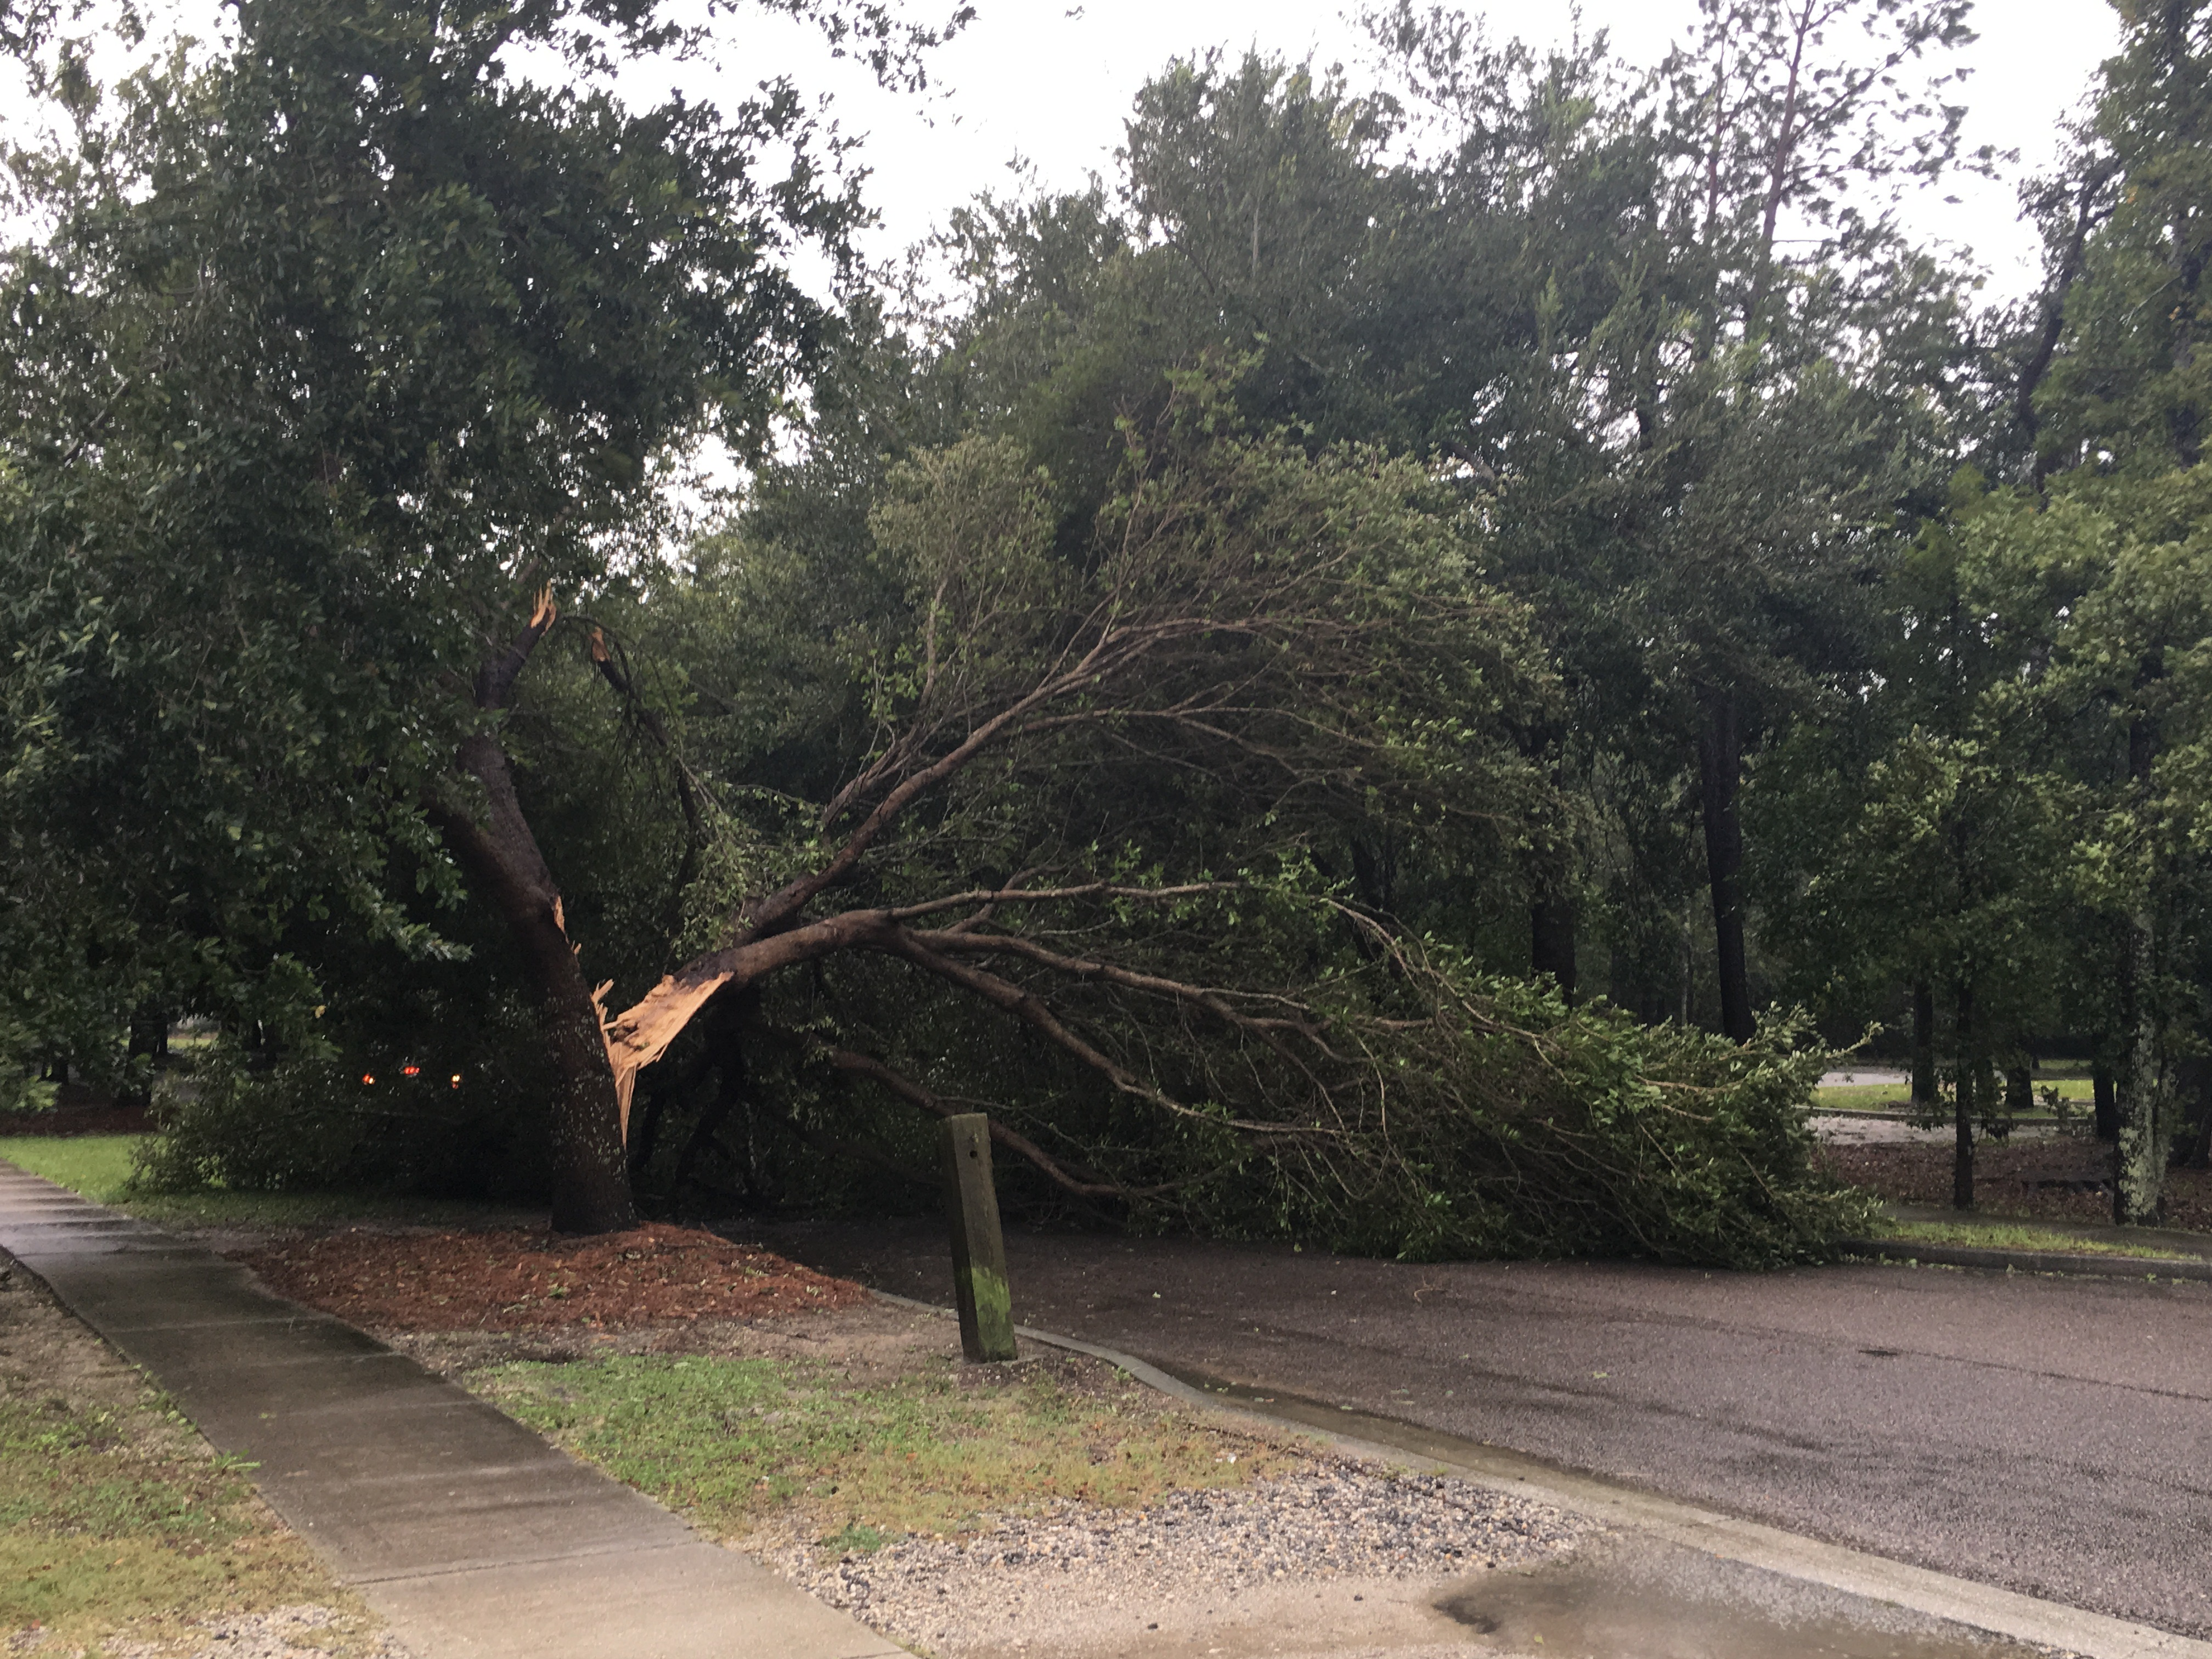 A downed tree on Etiwan Park Street near Bishop England High School.